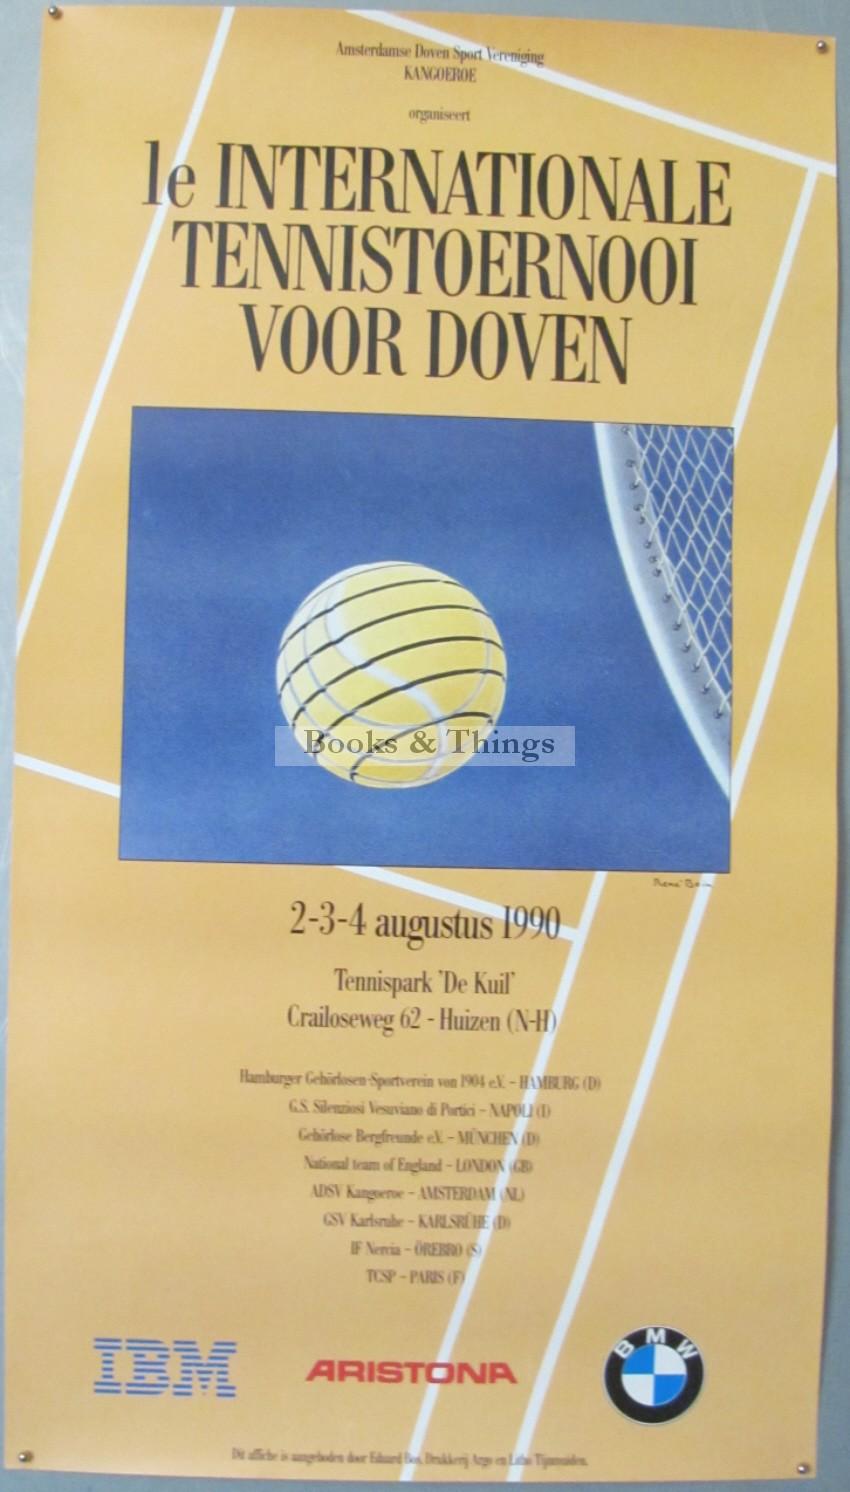 Rene Bain Toernooi tennis poster 1996